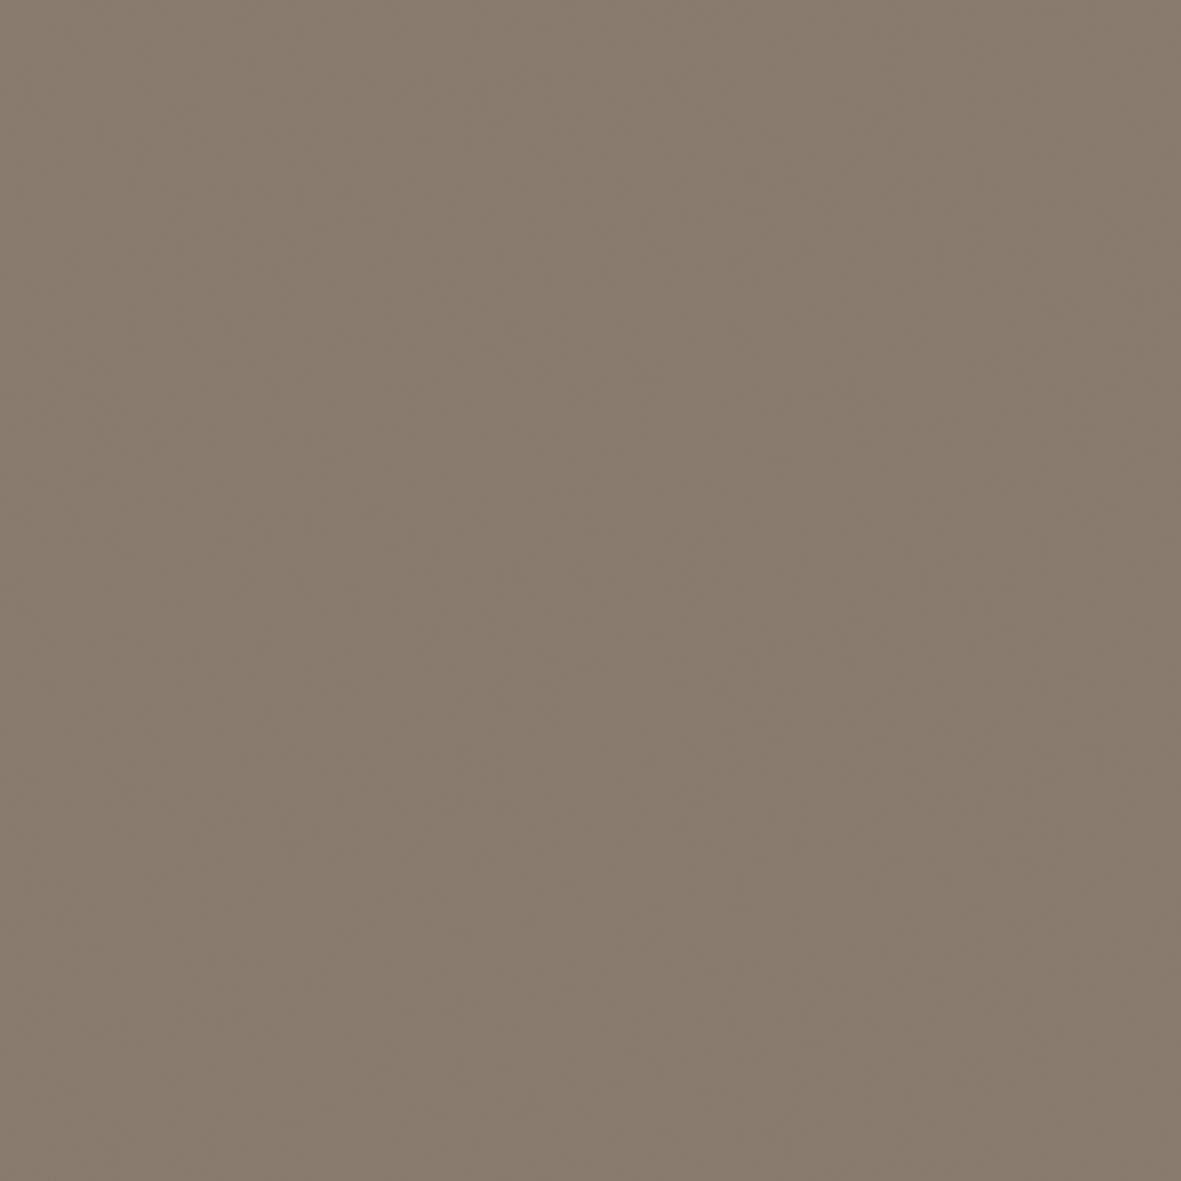 Kaisercraft Weave Texture Cardstock 12X12-Mushroom